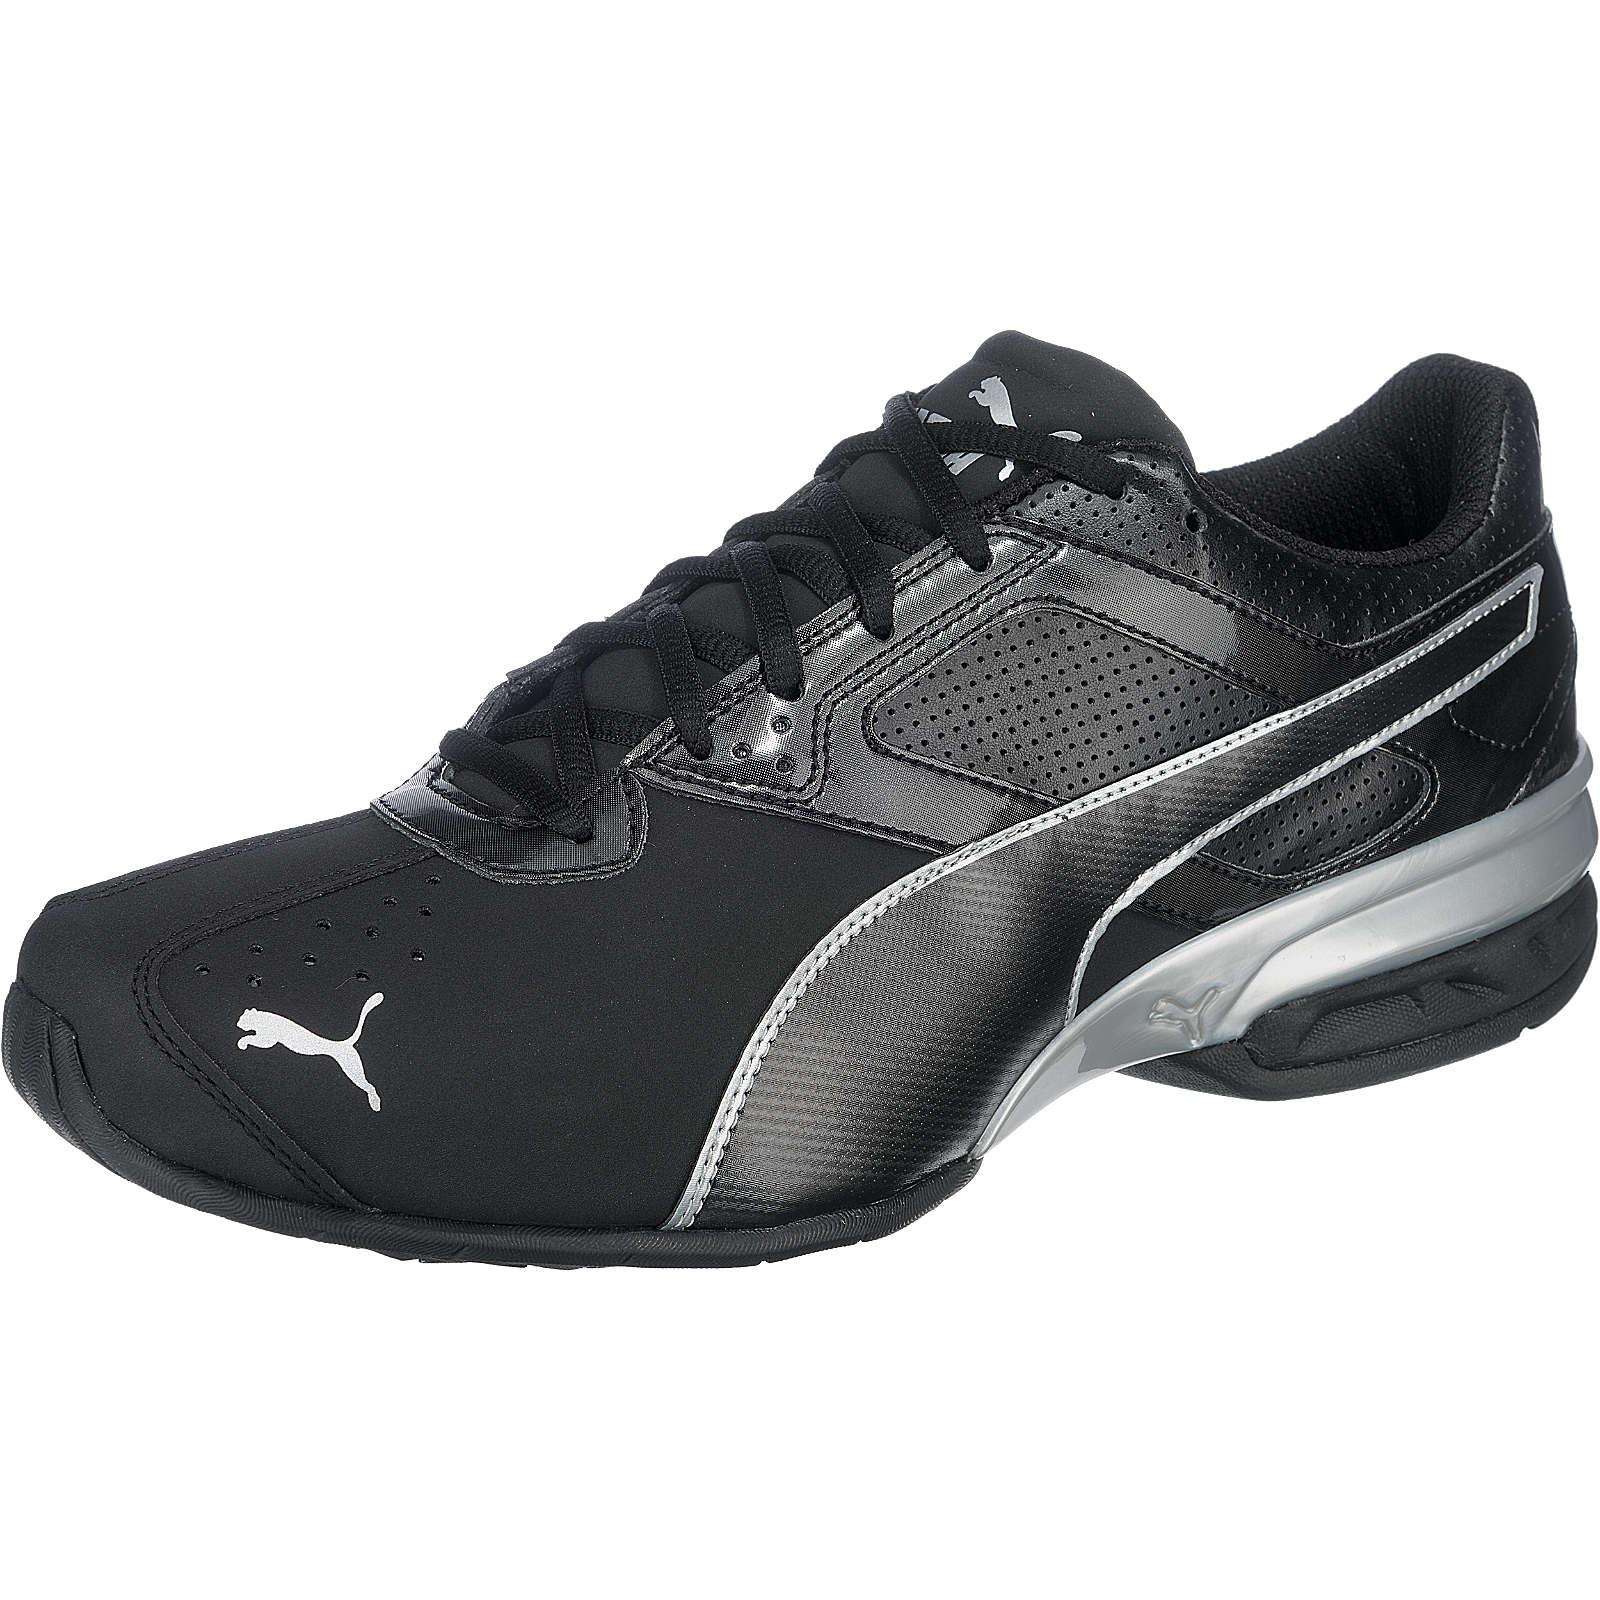 PUMA Tazon 6 FM Sneakers Low schwarz-kombi Herren Gr. 44,5